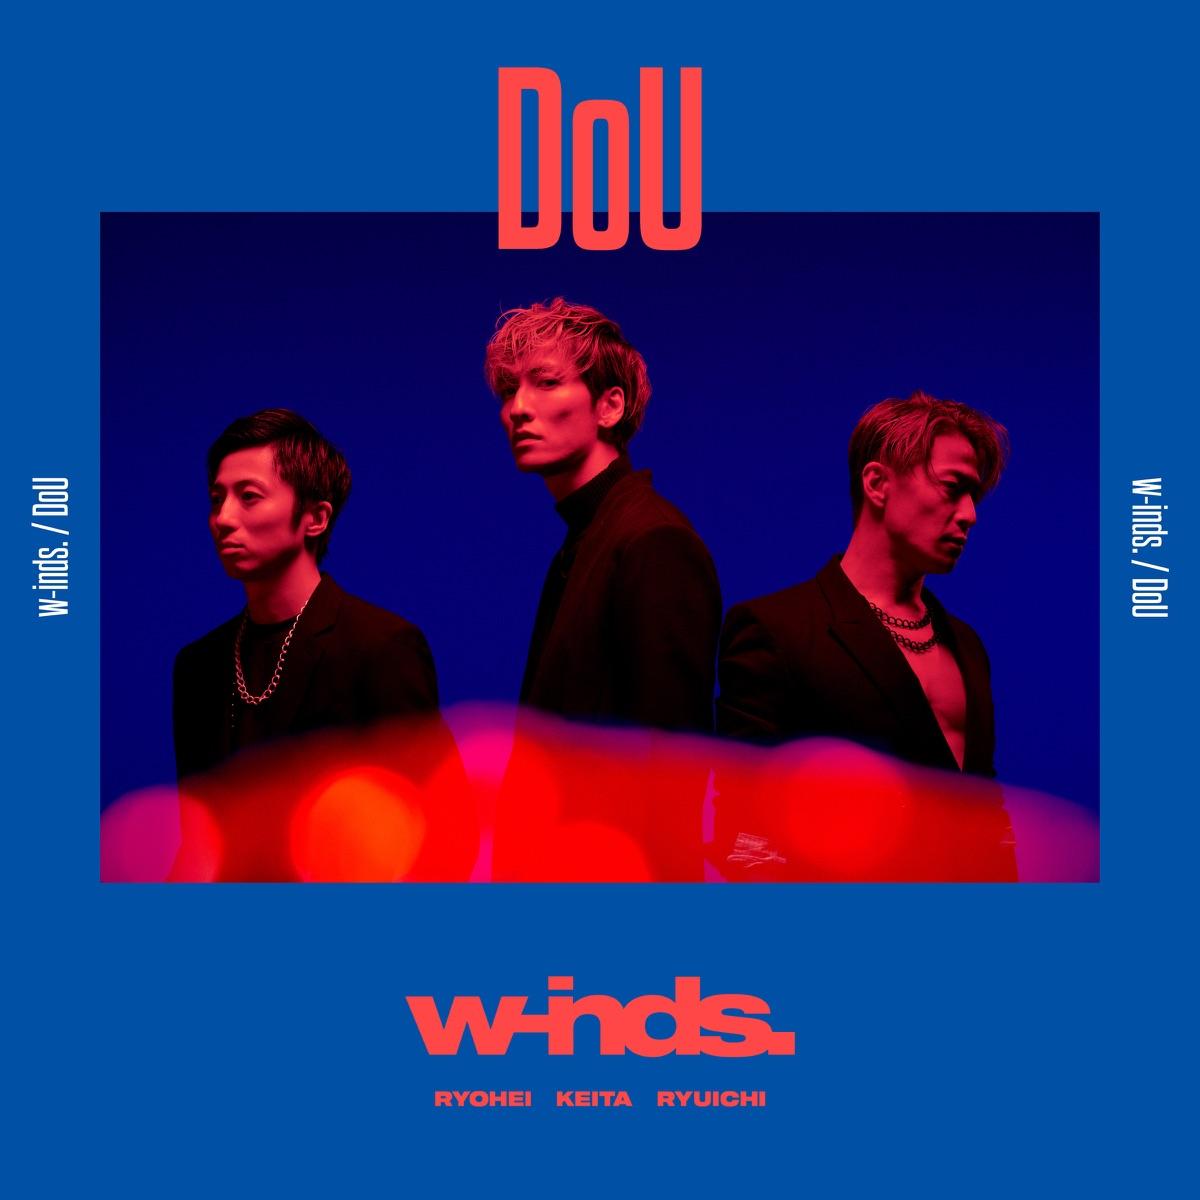 『w-inds. CANDY 歌詞』収録の『DoU』ジャケット